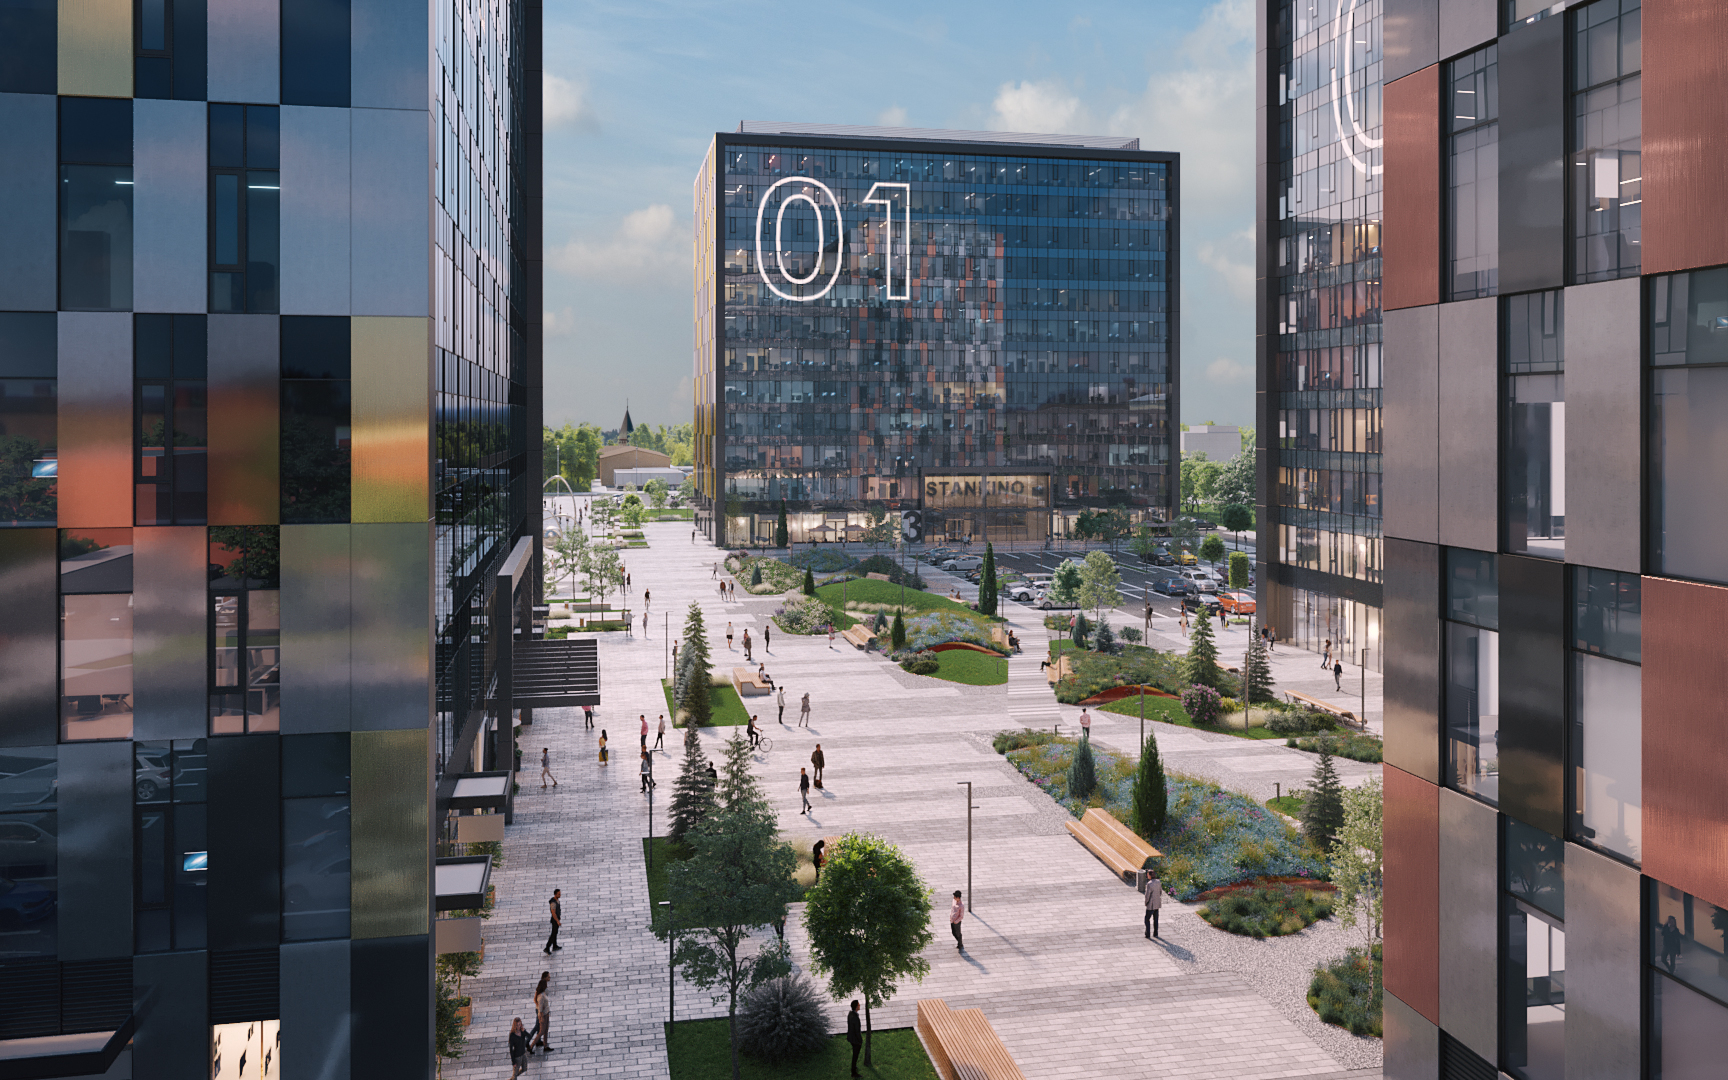 Вид на центральную площадь бизнес-парка «Останкино». Визуализация ГК «Пионер»